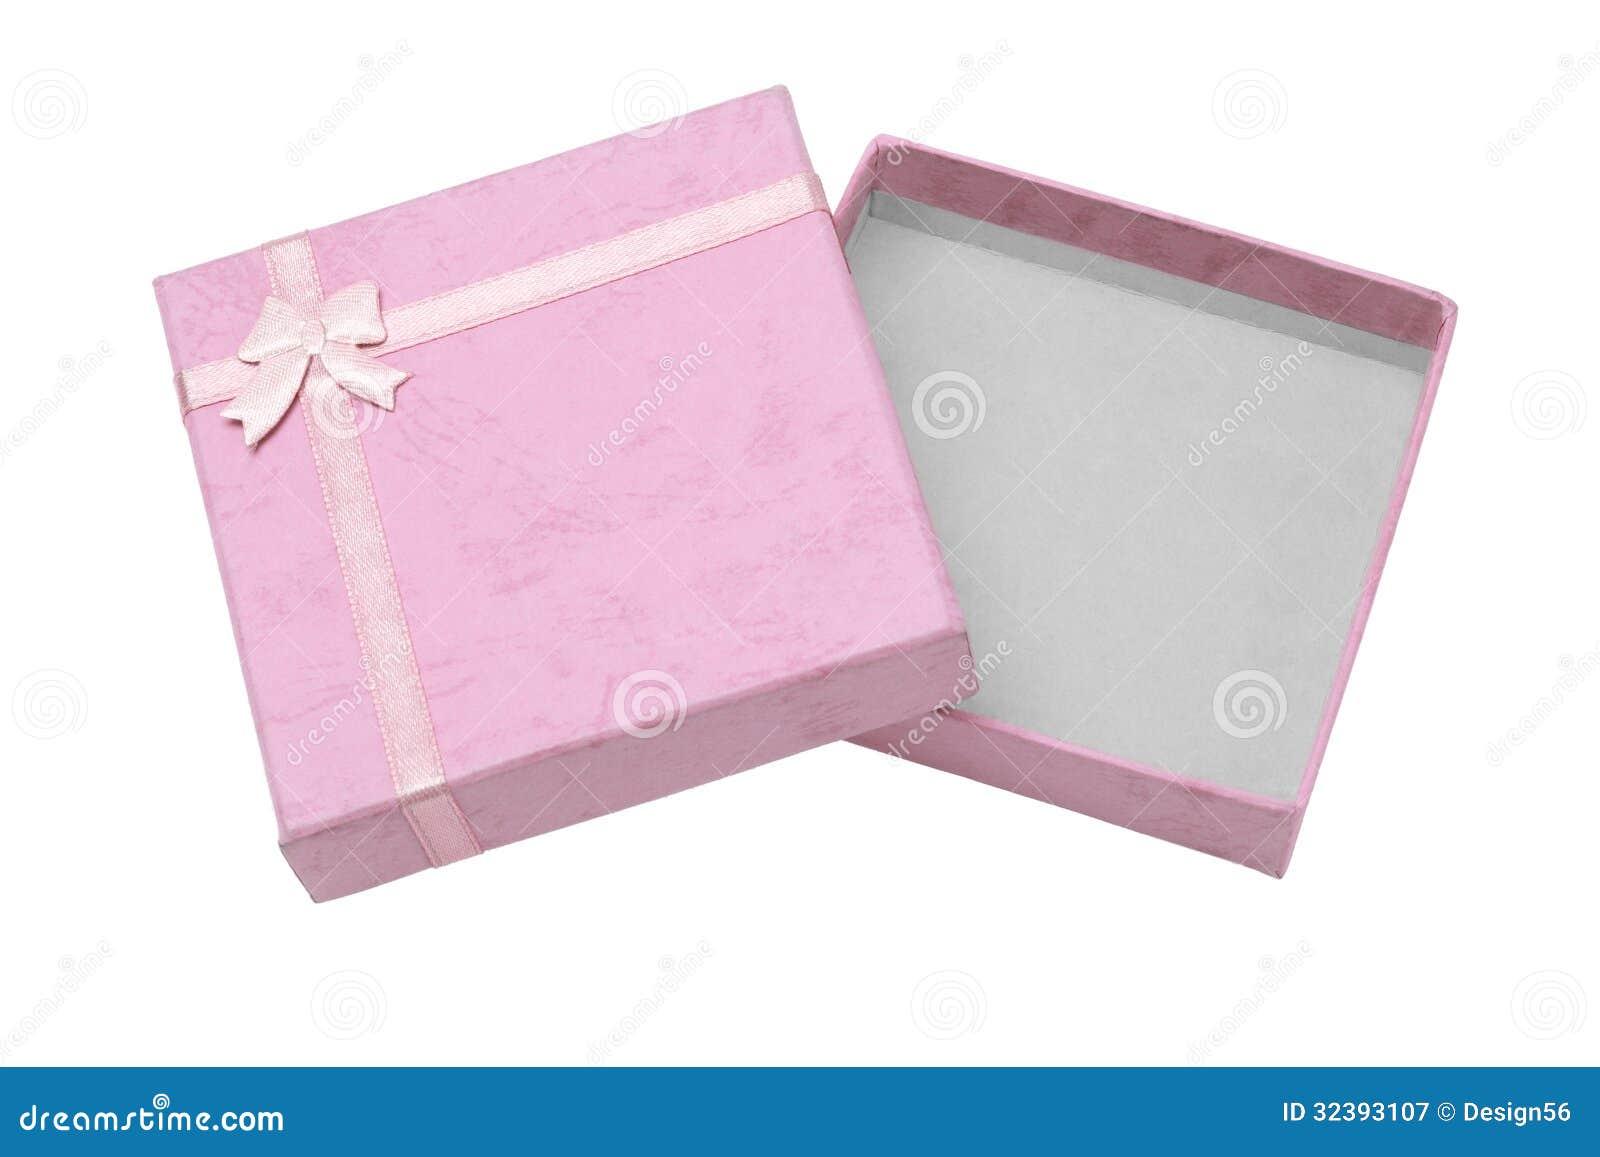 Empty Gift Box Royalty Free Stock Photography - Image: 32393107